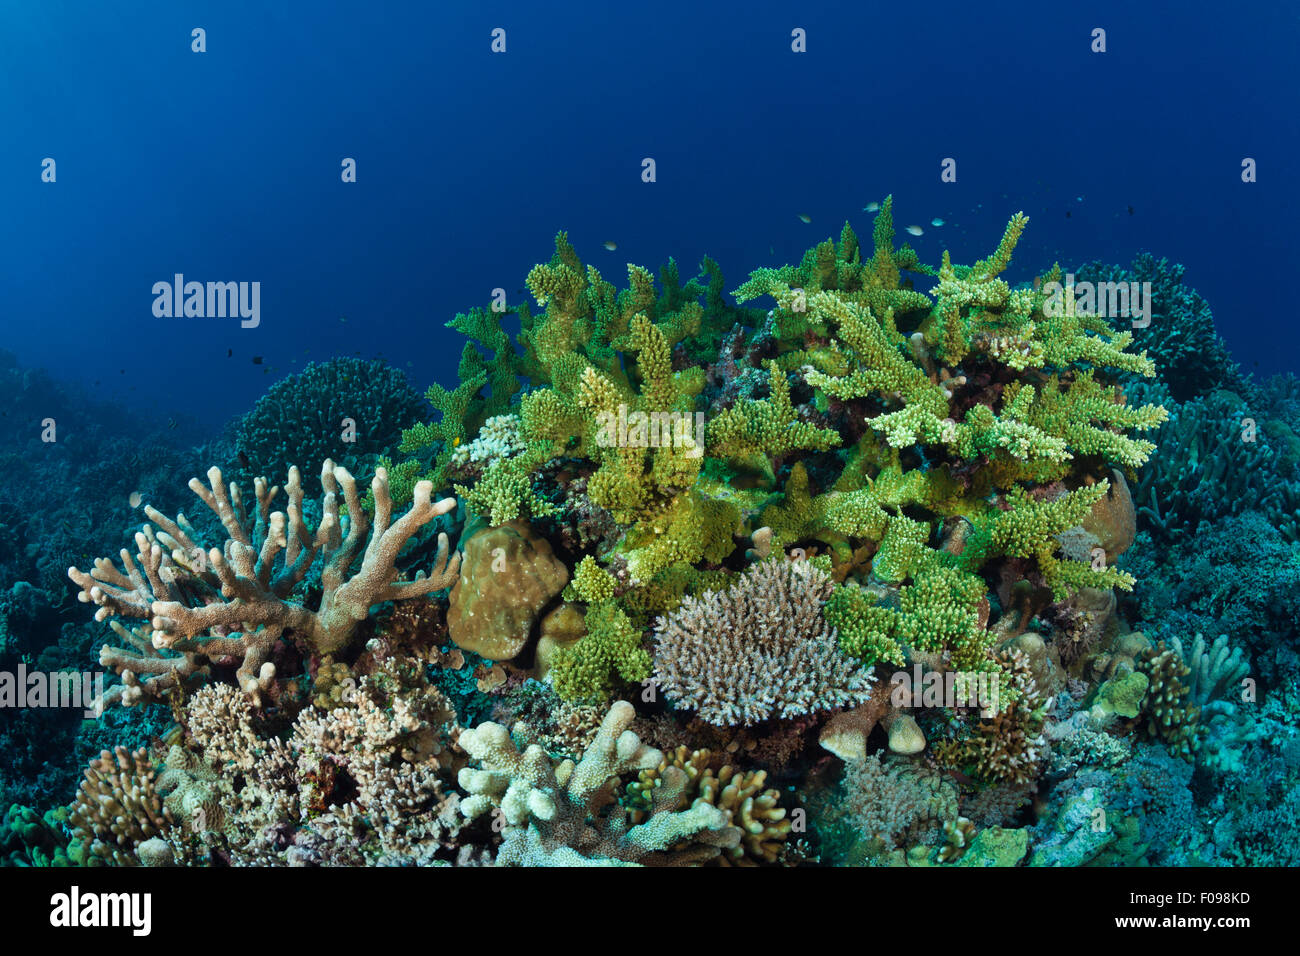 Récif de corail dur, lagon de Marovo, Îles Salomon Photo Stock